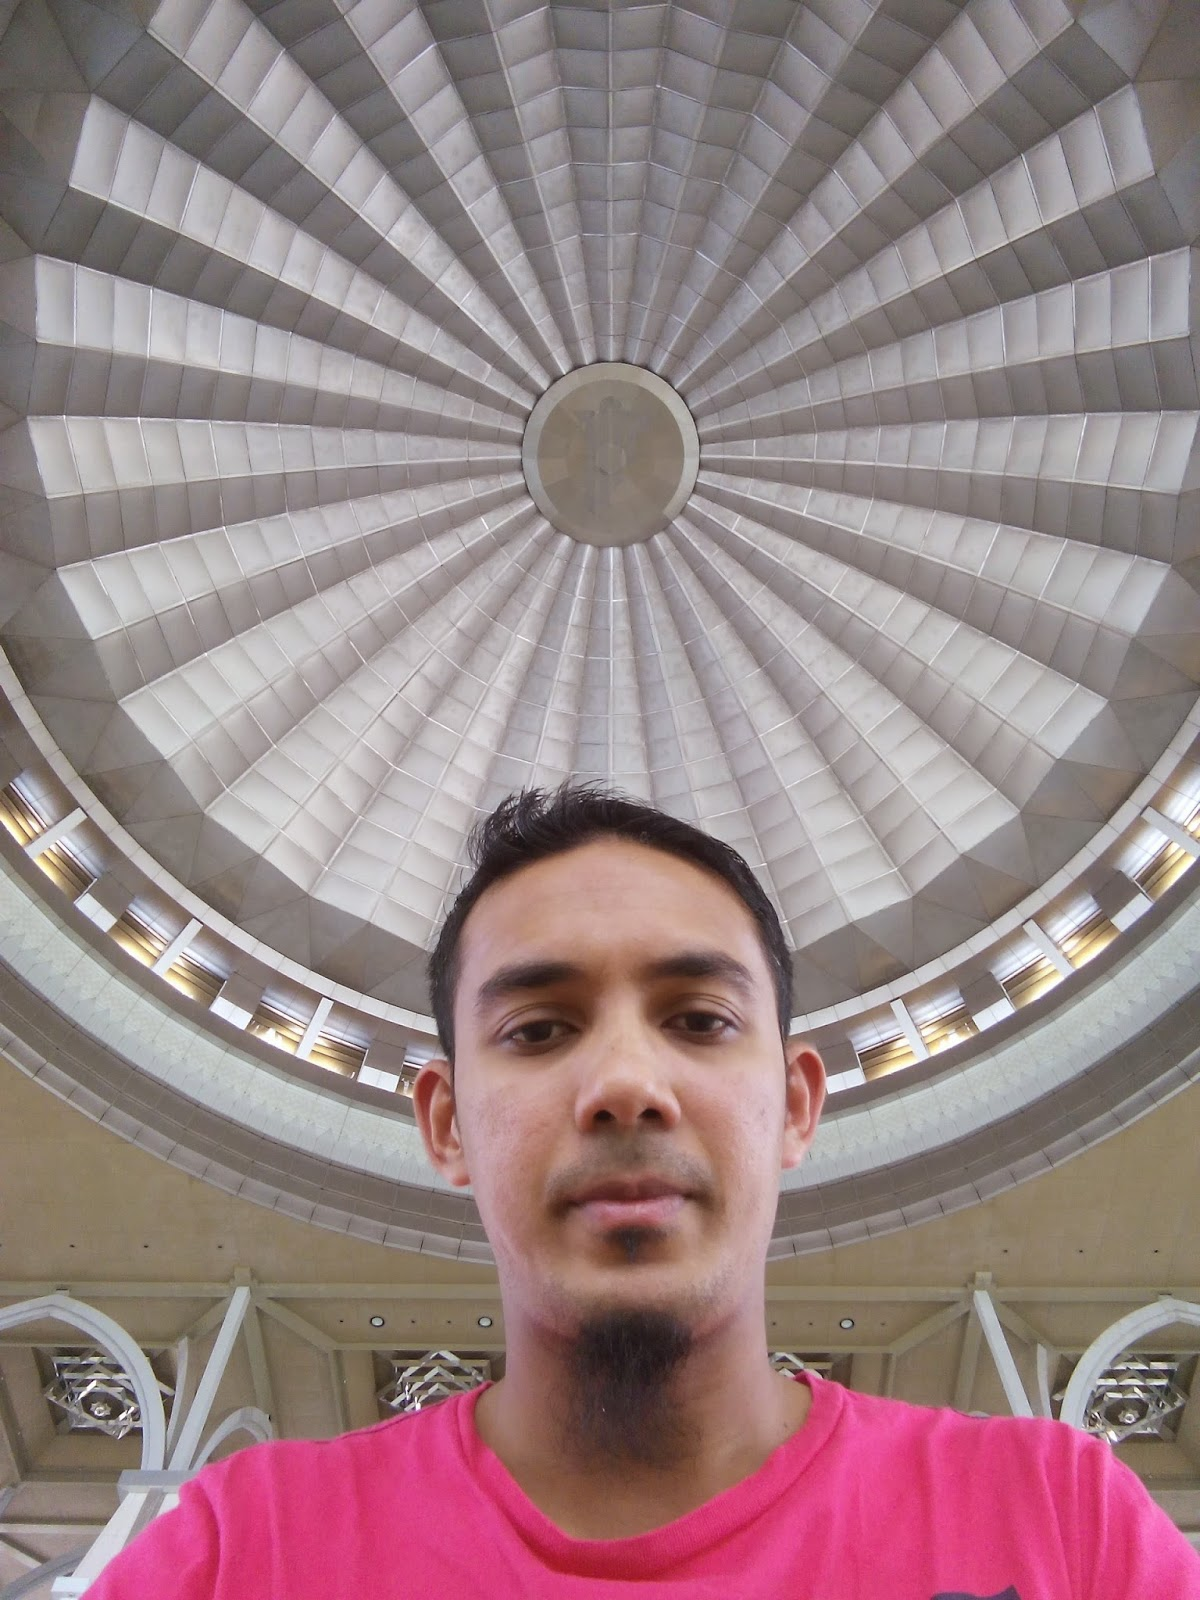 masjid besi, kubah cantik, gambar cantik, putrajaya, Selfie